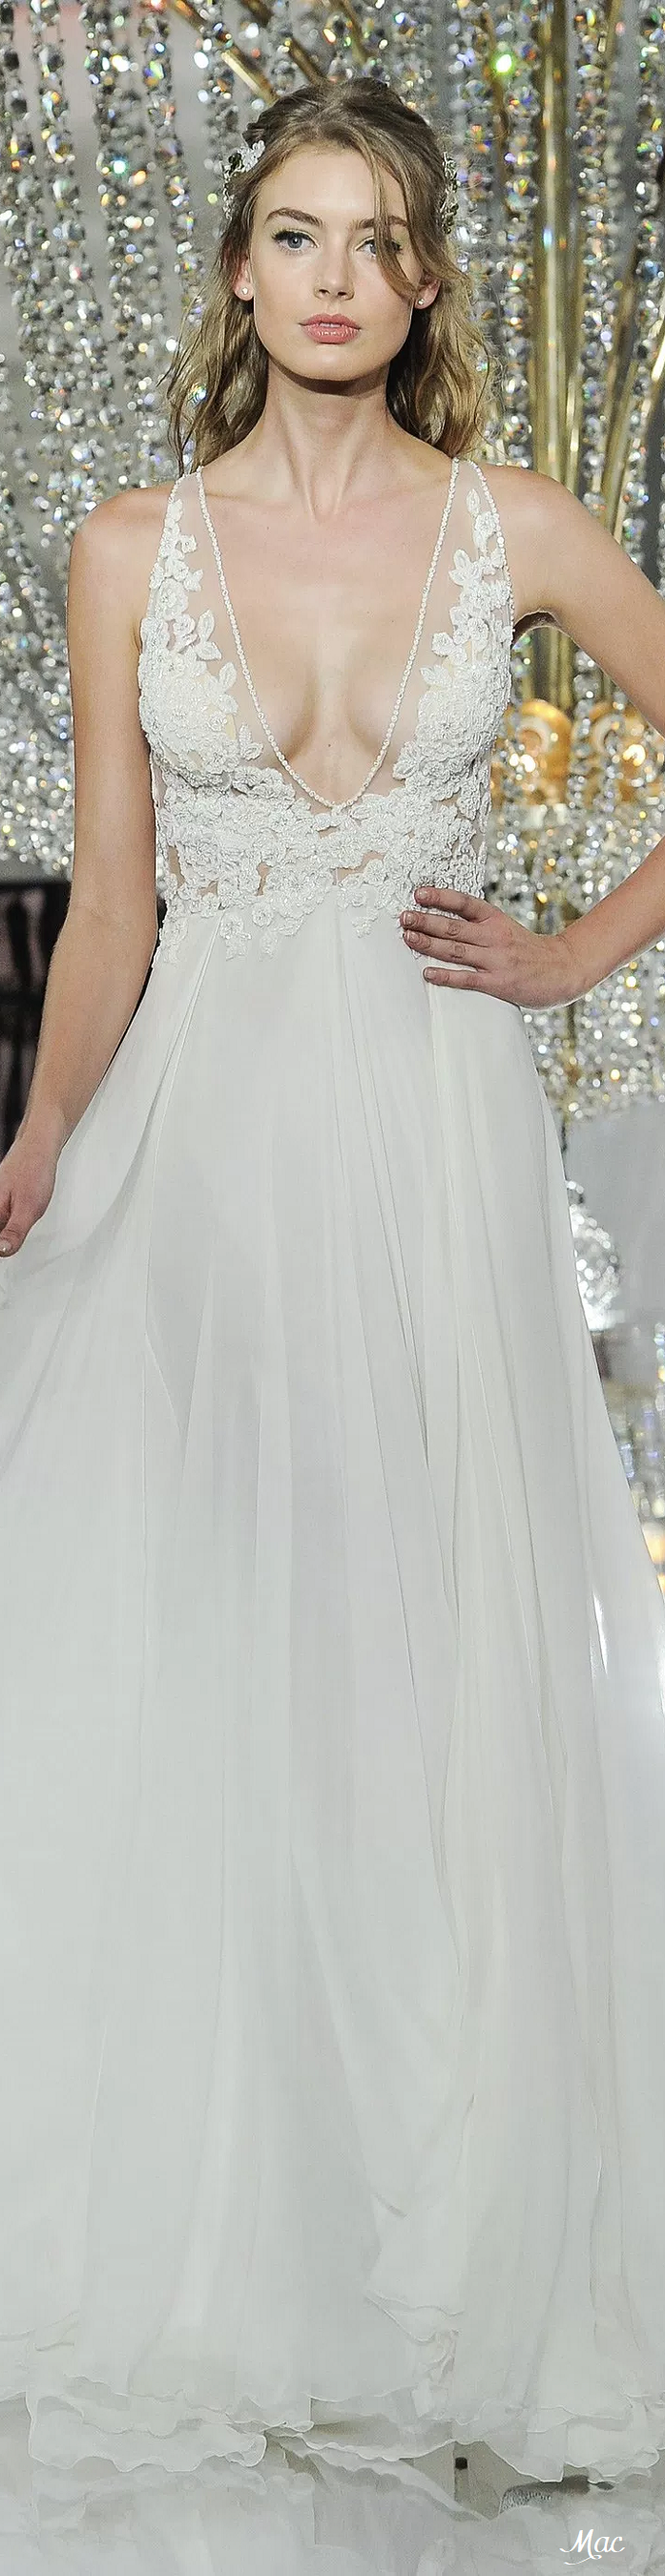 Fall bridal pronovias wedding dresses pinterest